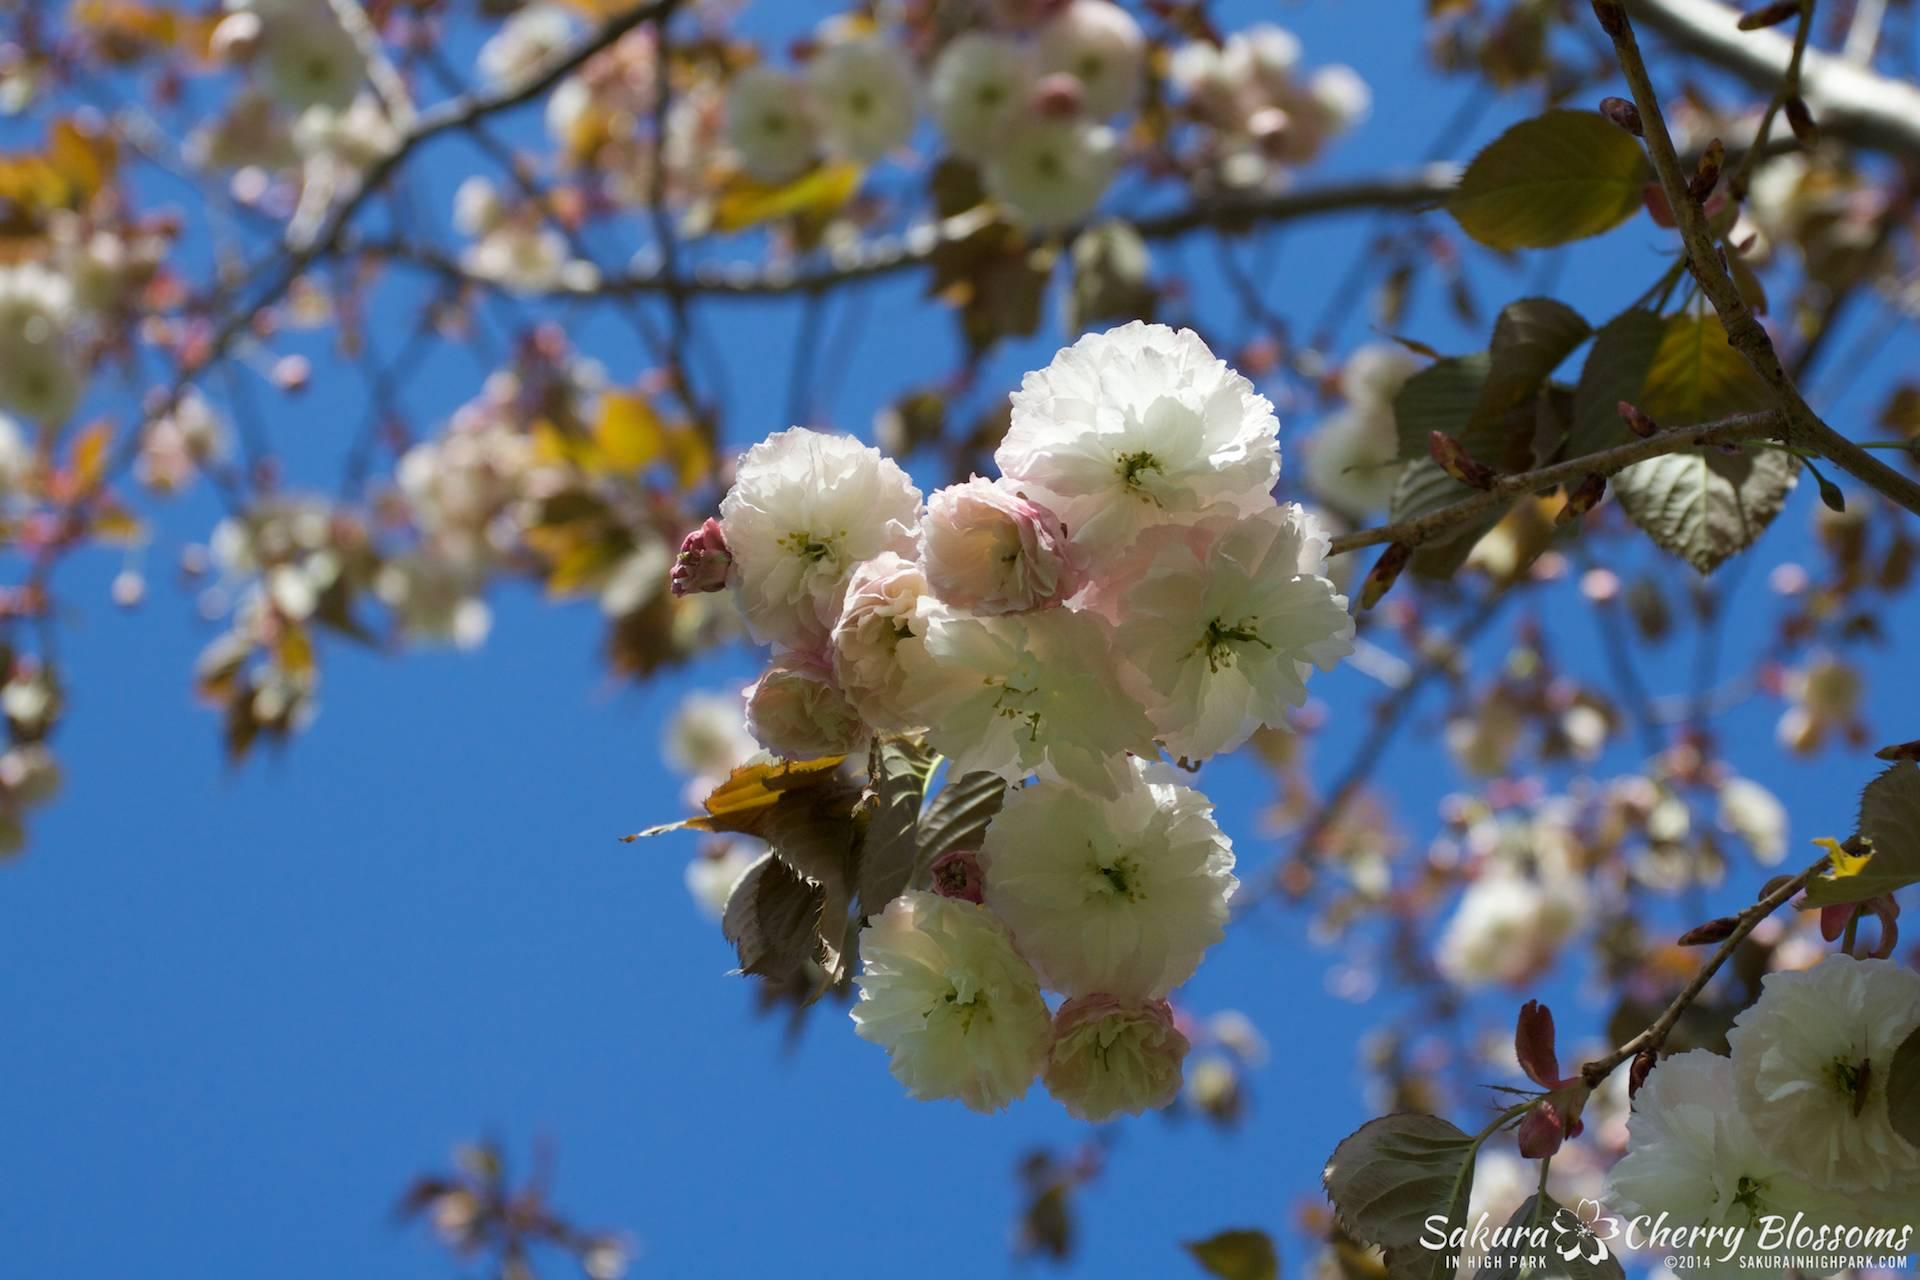 SakuraInHighPark-May2414-420.jpg